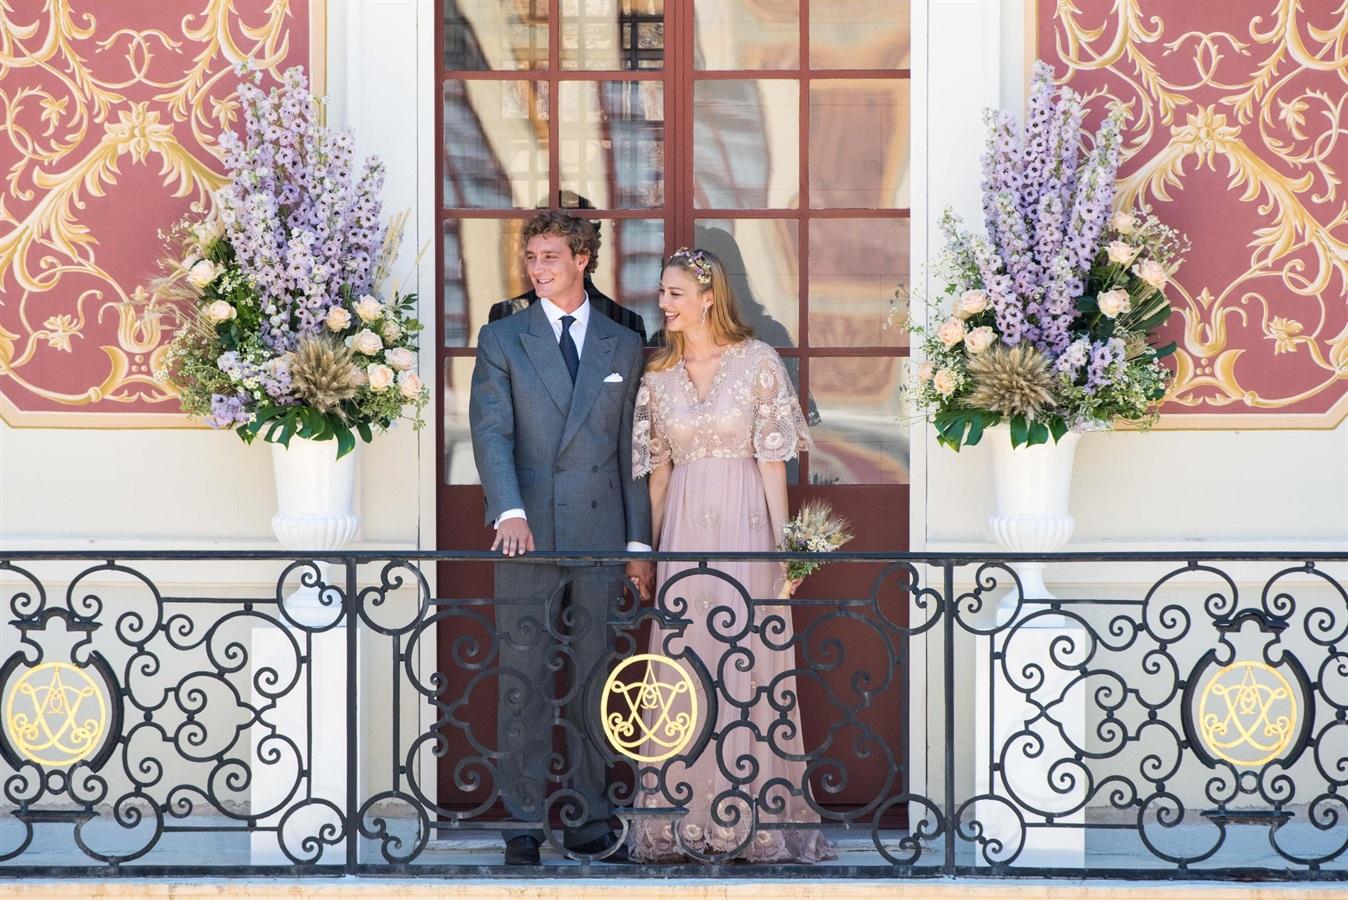 Свадьба принца Монако Пьера Казираги